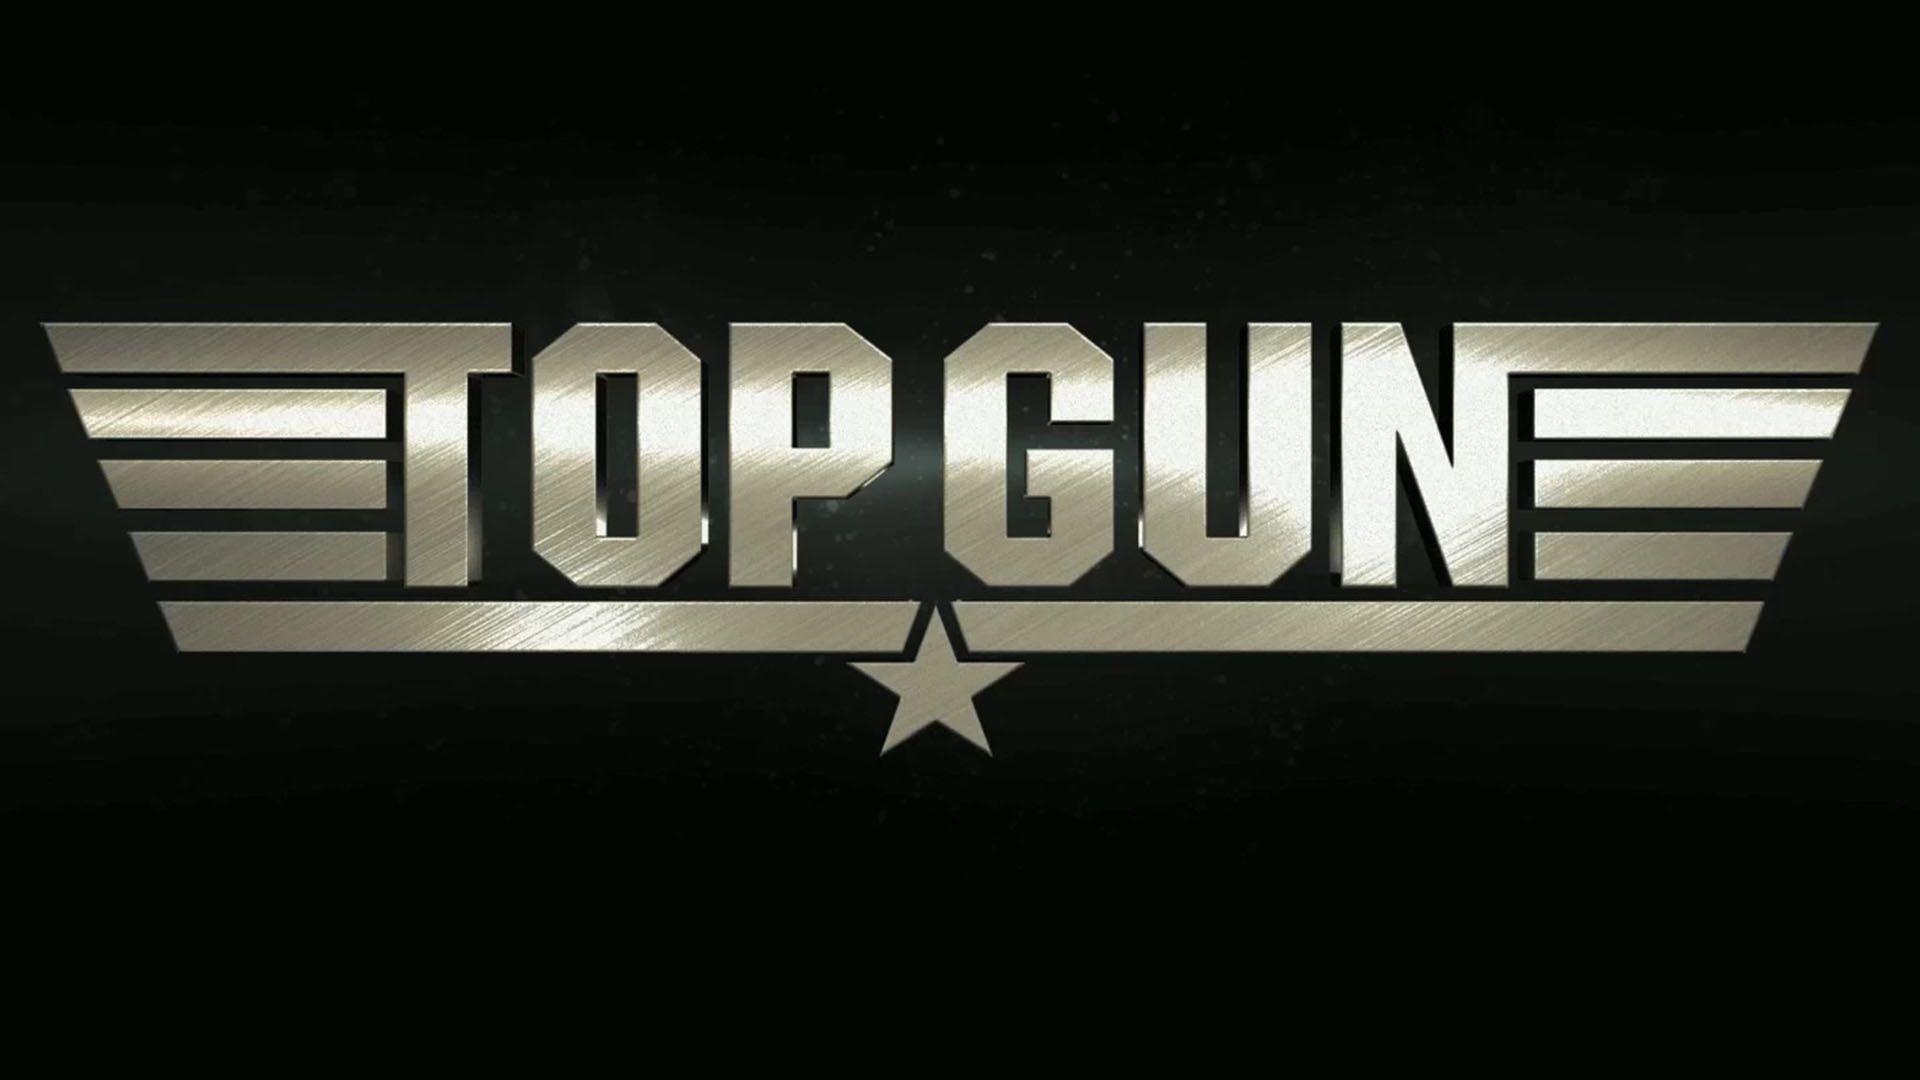 Top Gun Wallpapers 1920x1080